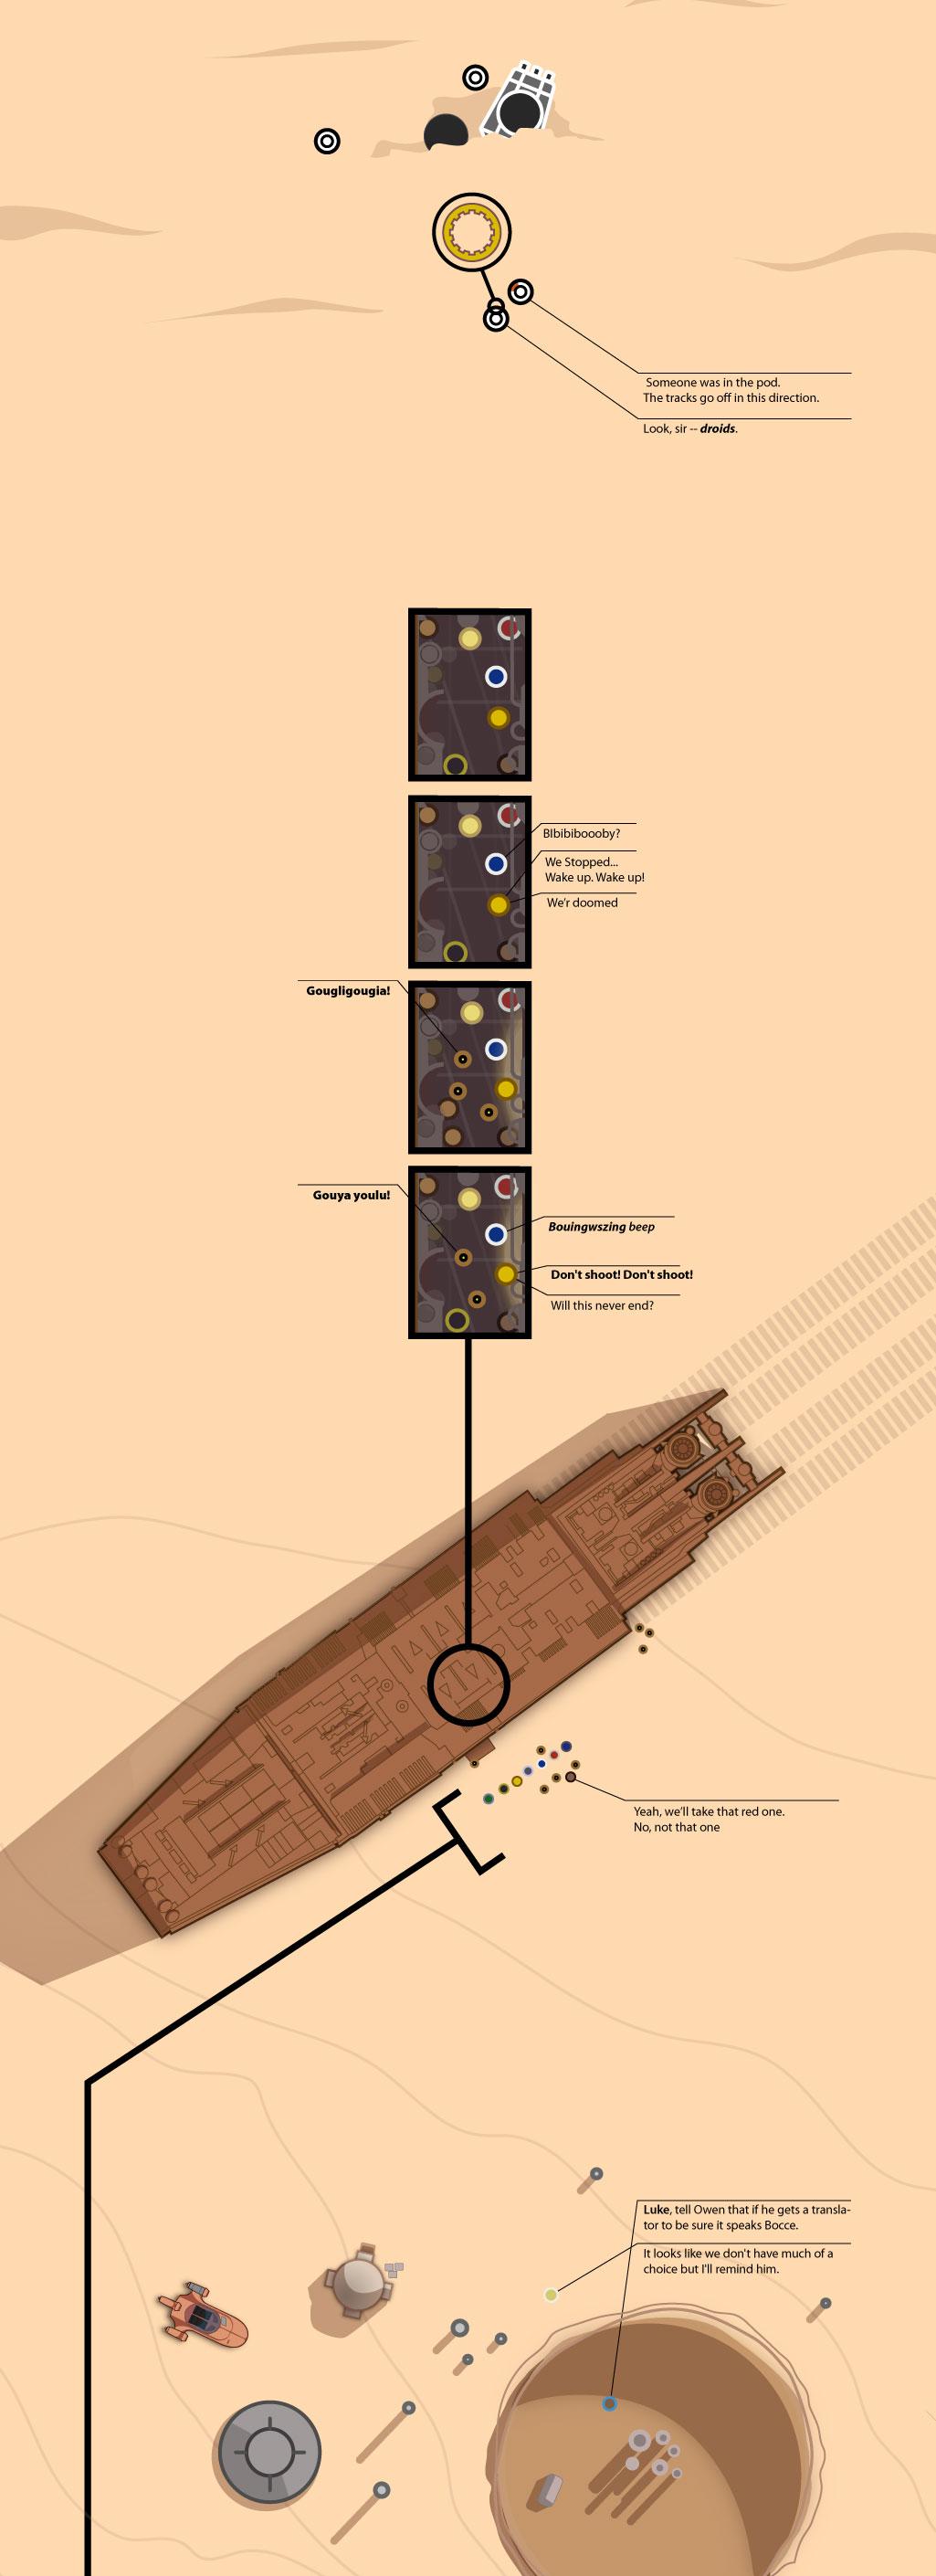 9-Martin-Panchaud-star-wars-histoire